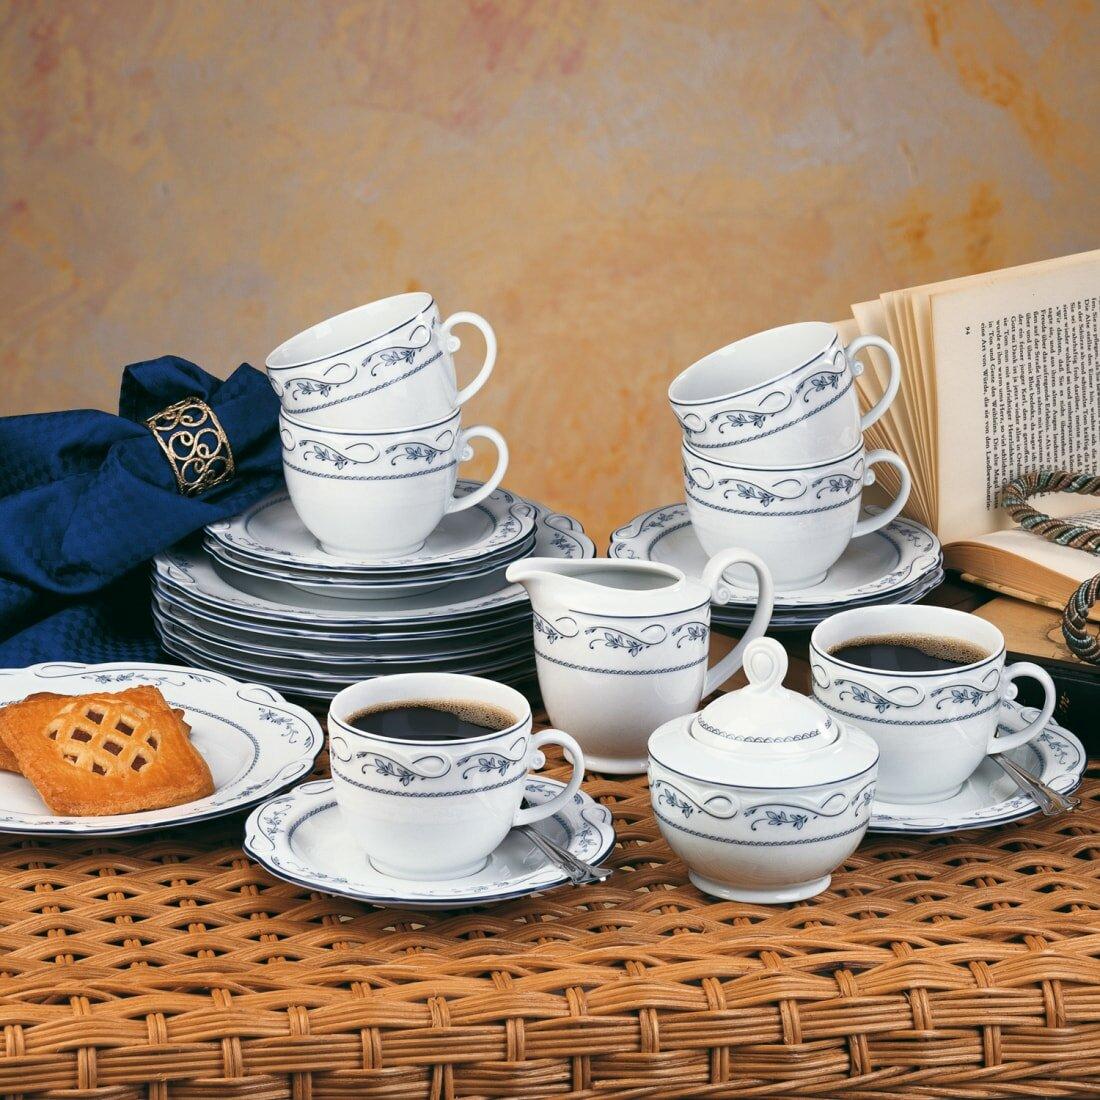 seltmann weiden 20 tlg kaffeeservice desiree aus porzellan bewertungen. Black Bedroom Furniture Sets. Home Design Ideas